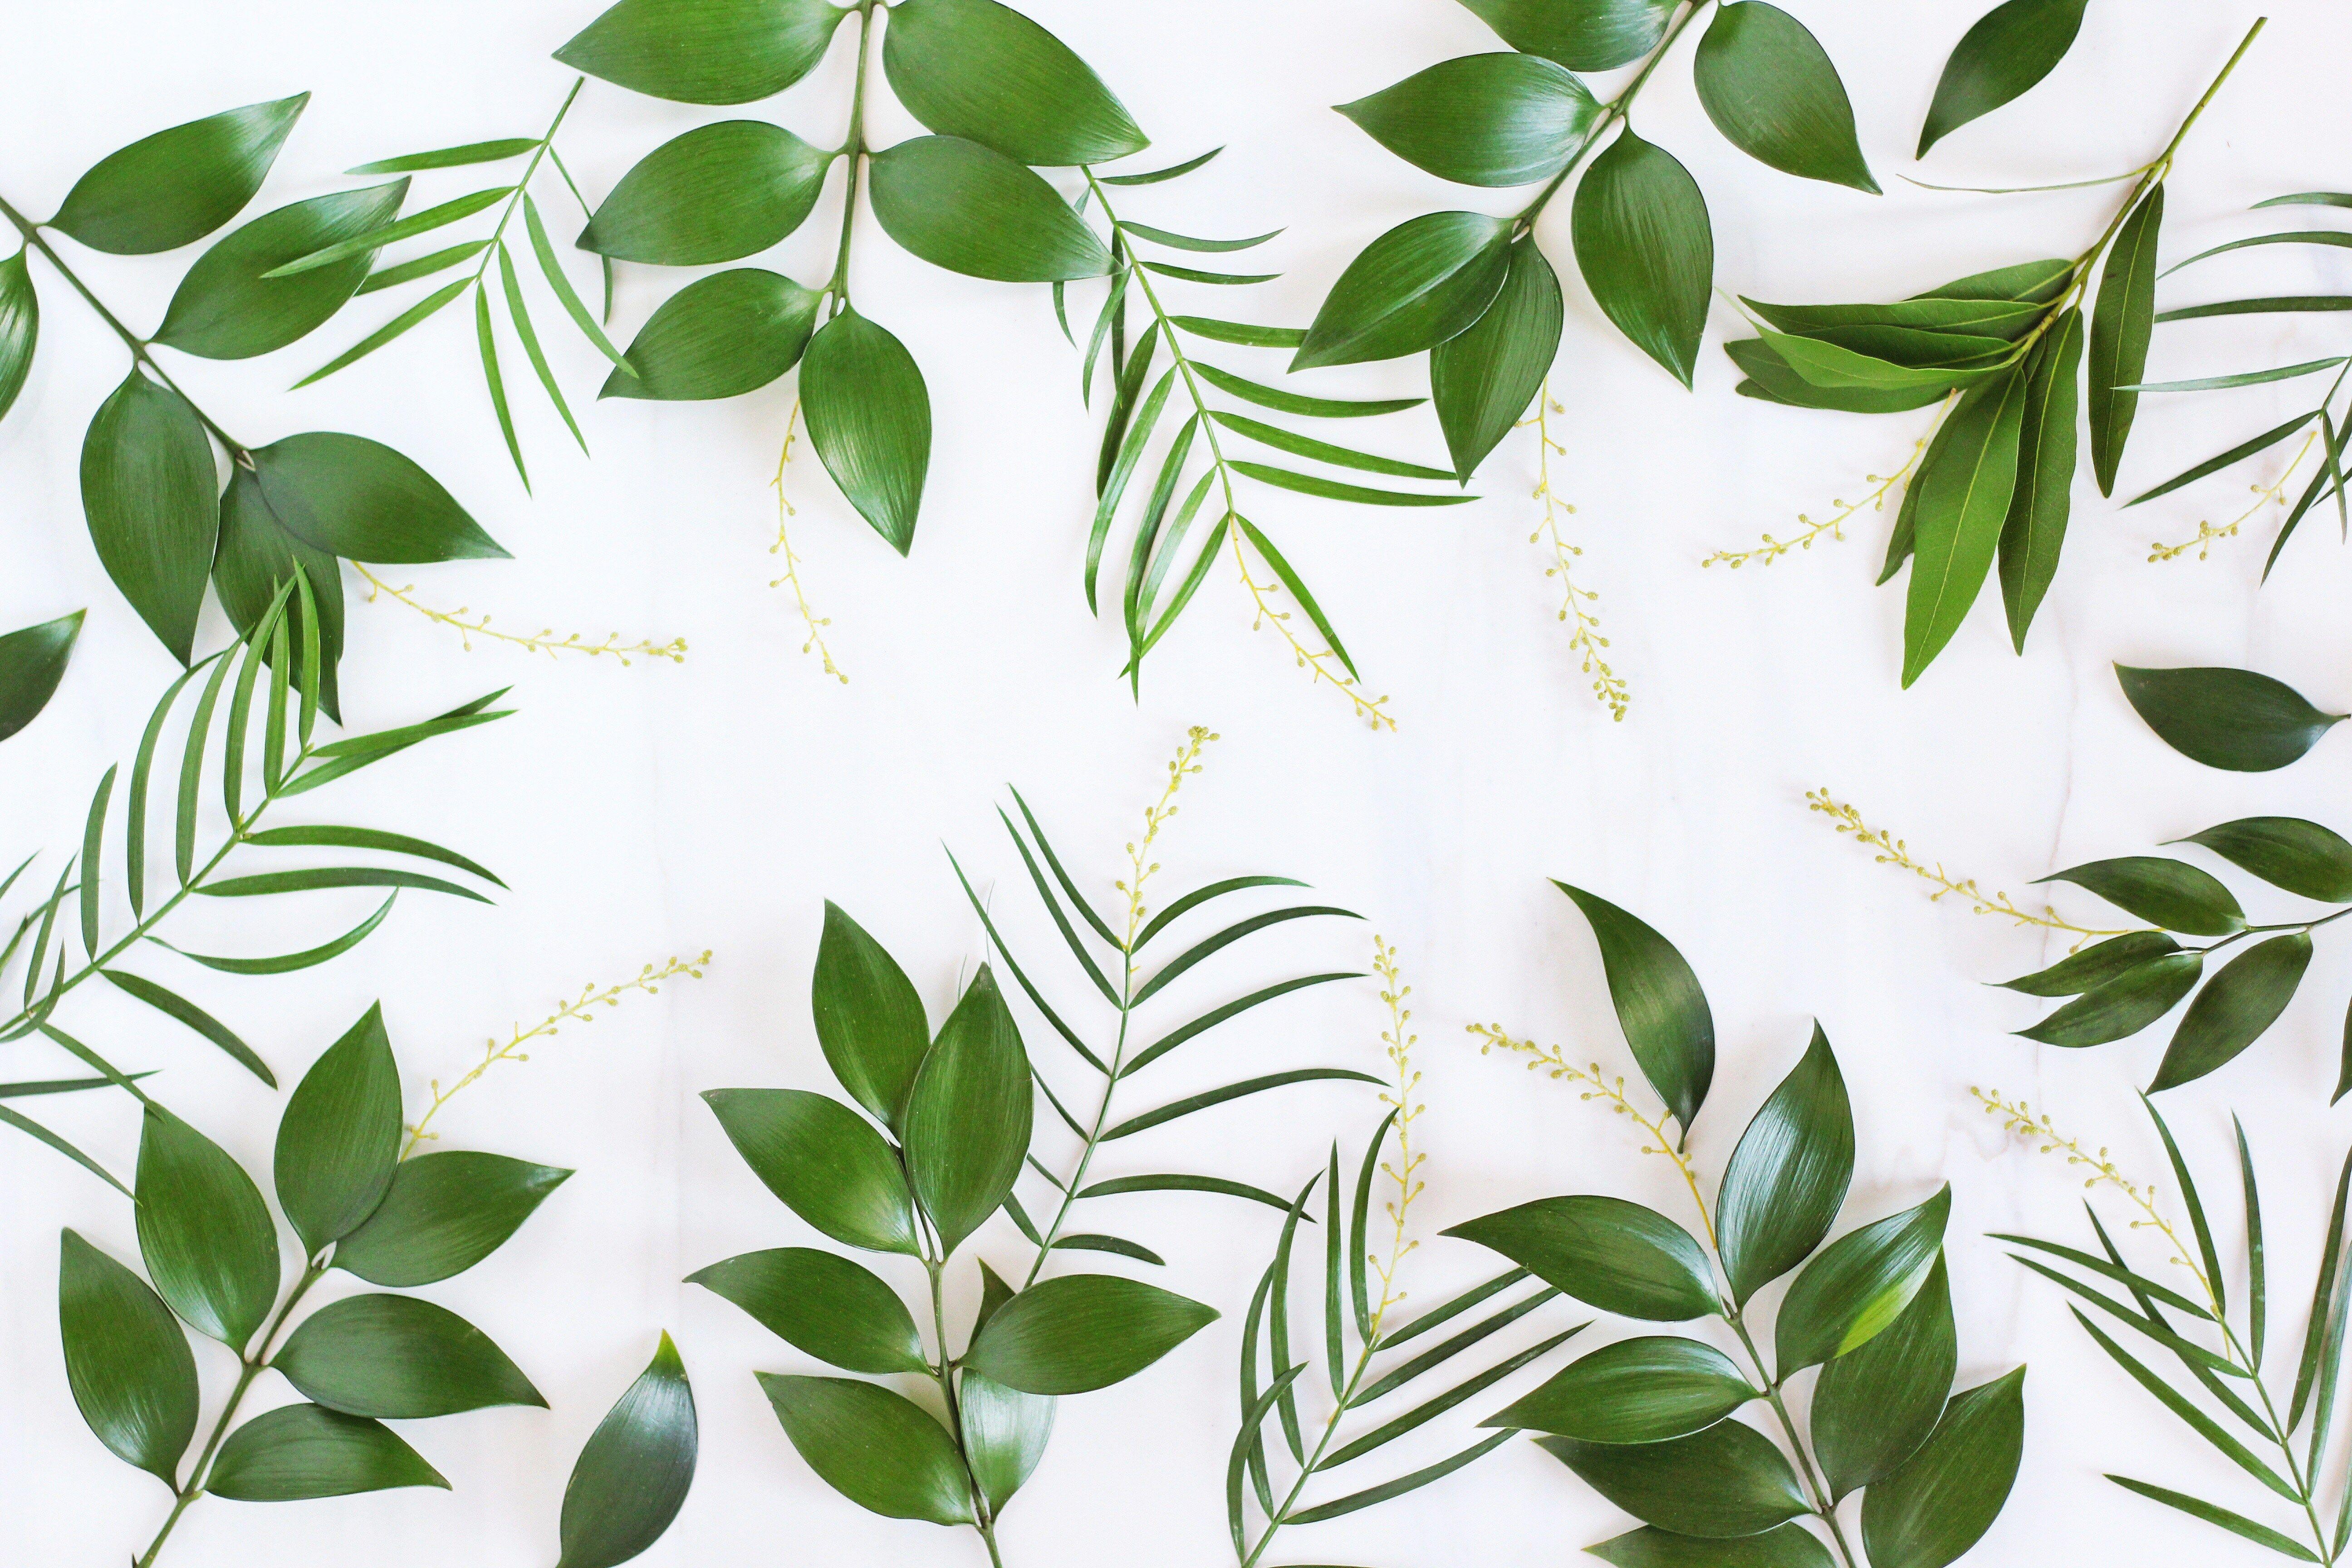 Digital Blooms March 2017 Free Desktop Wallpaper Greenery Wallpaper Computer Wallpaper Desktop Wallpapers